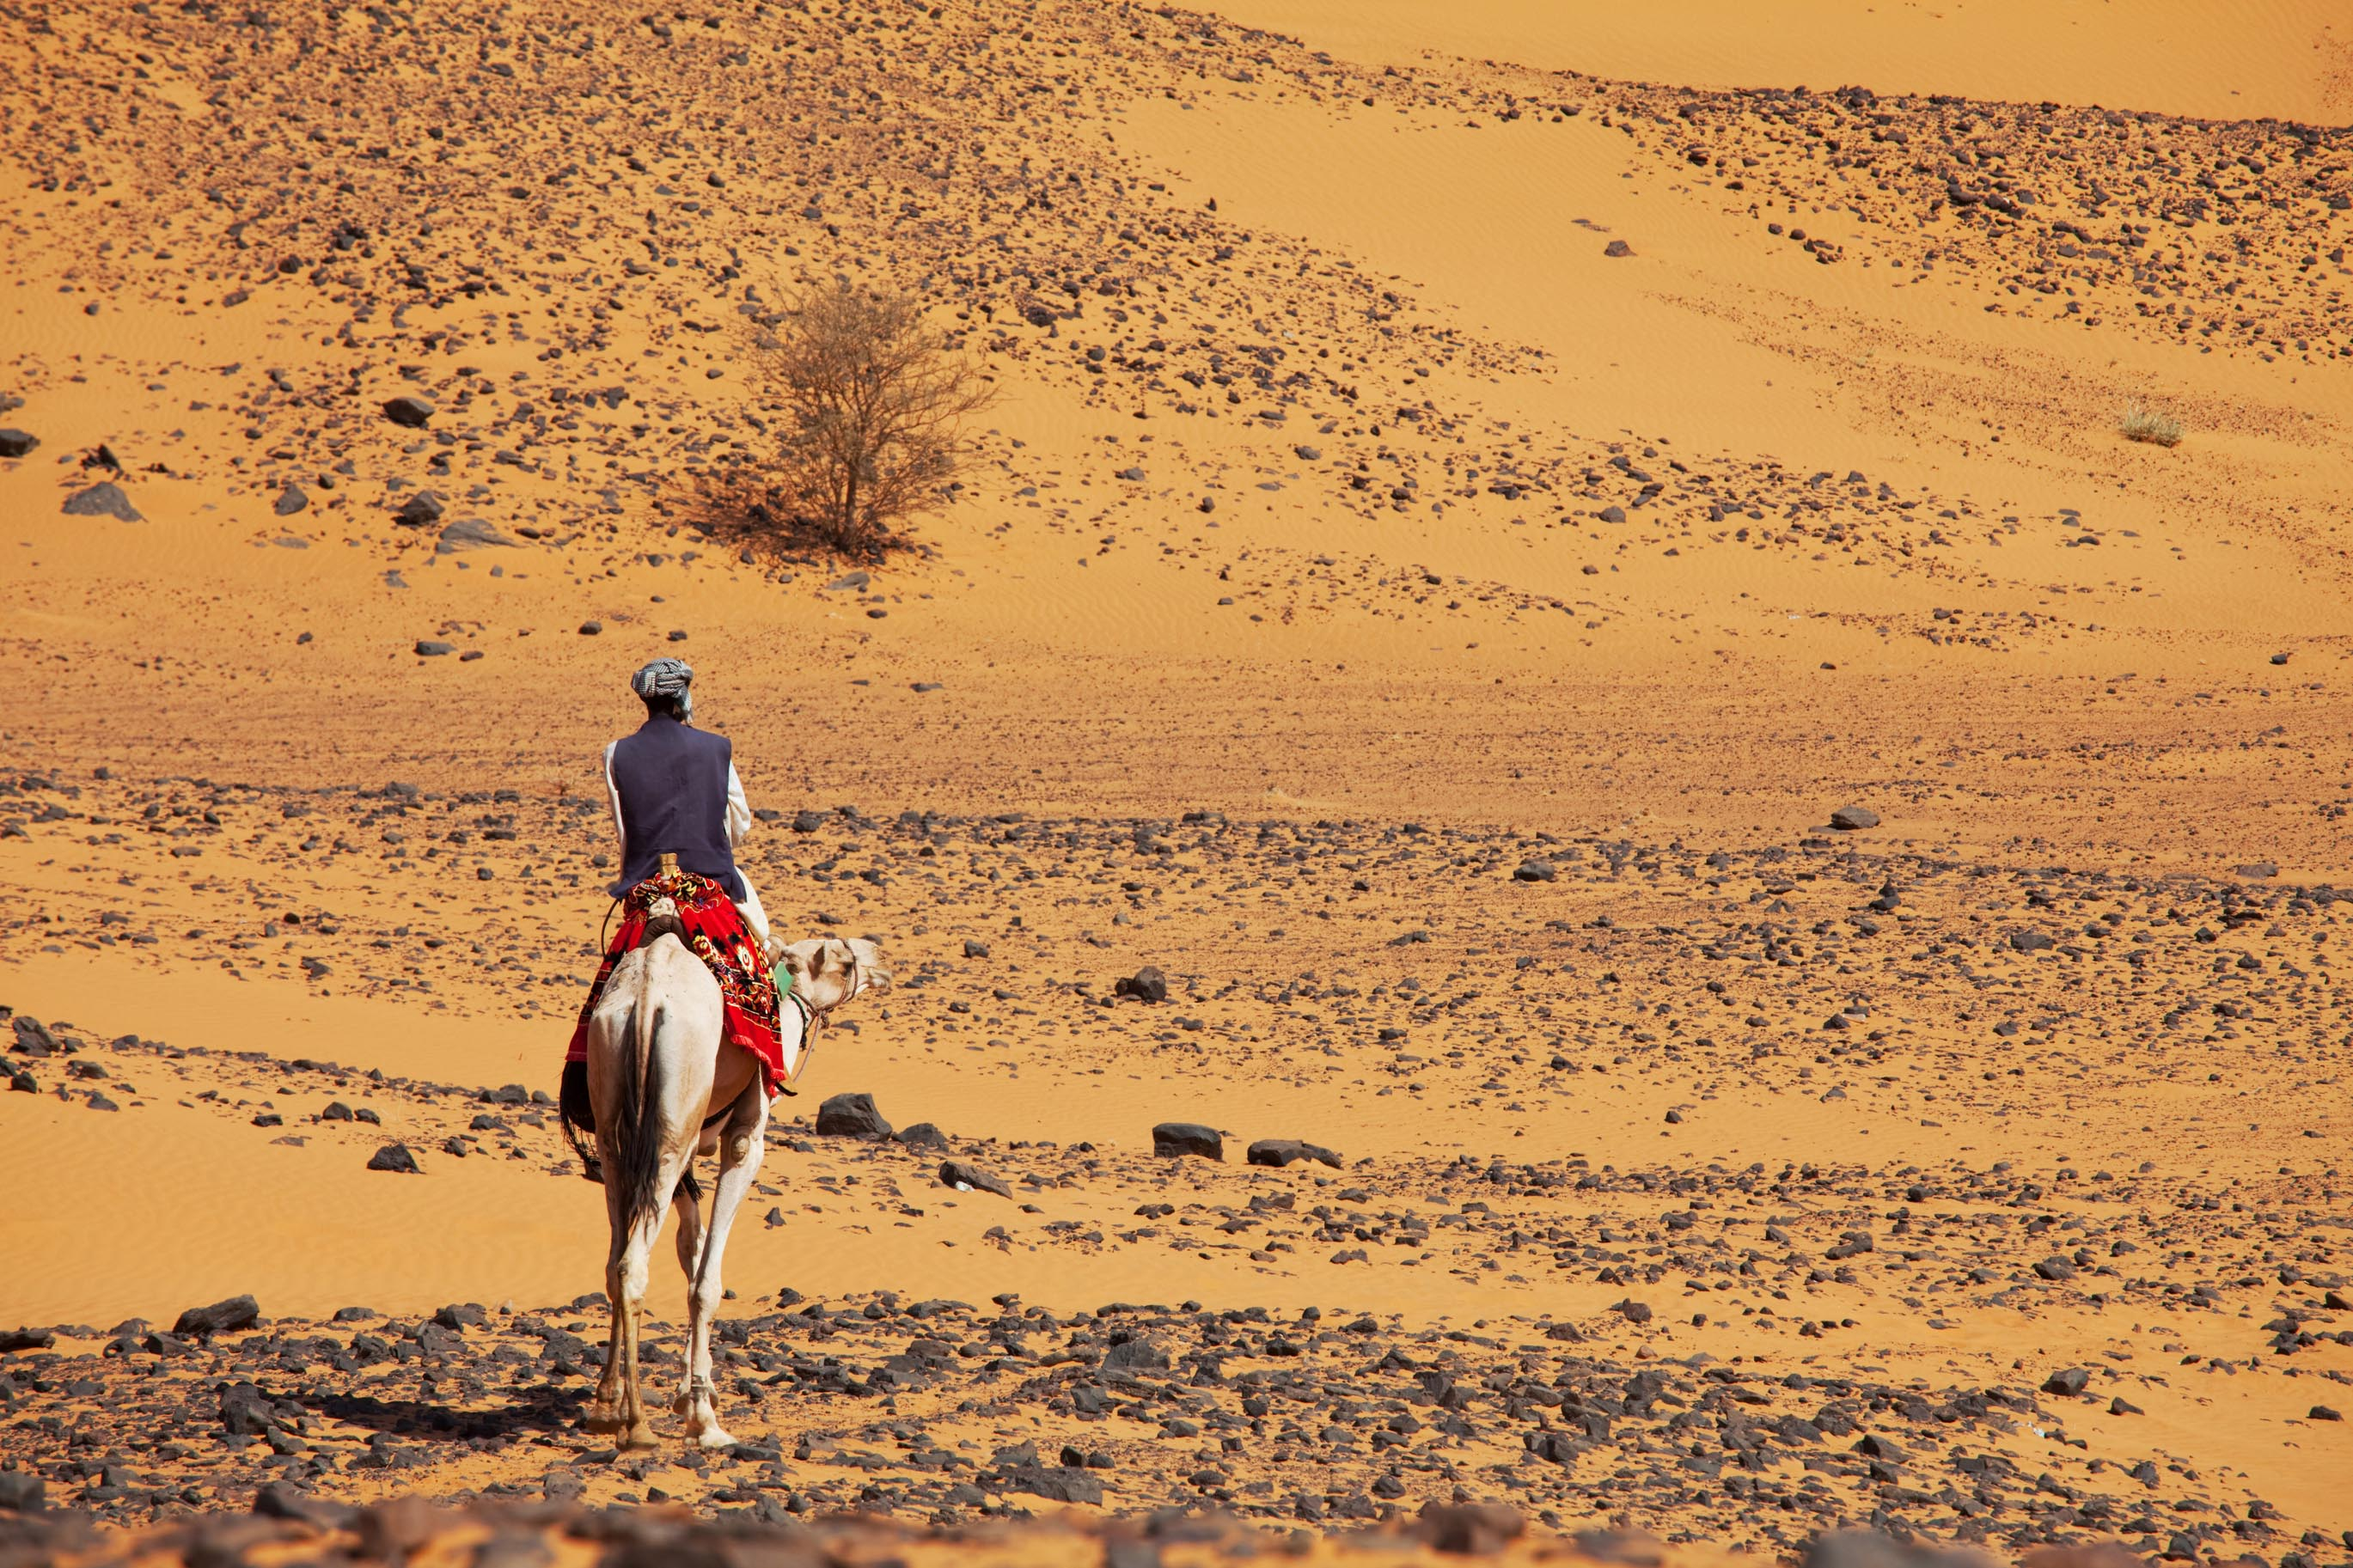 Sudanese camel rider | Bild (Ausschnitt): © Kamchatka - Dreamstime.com